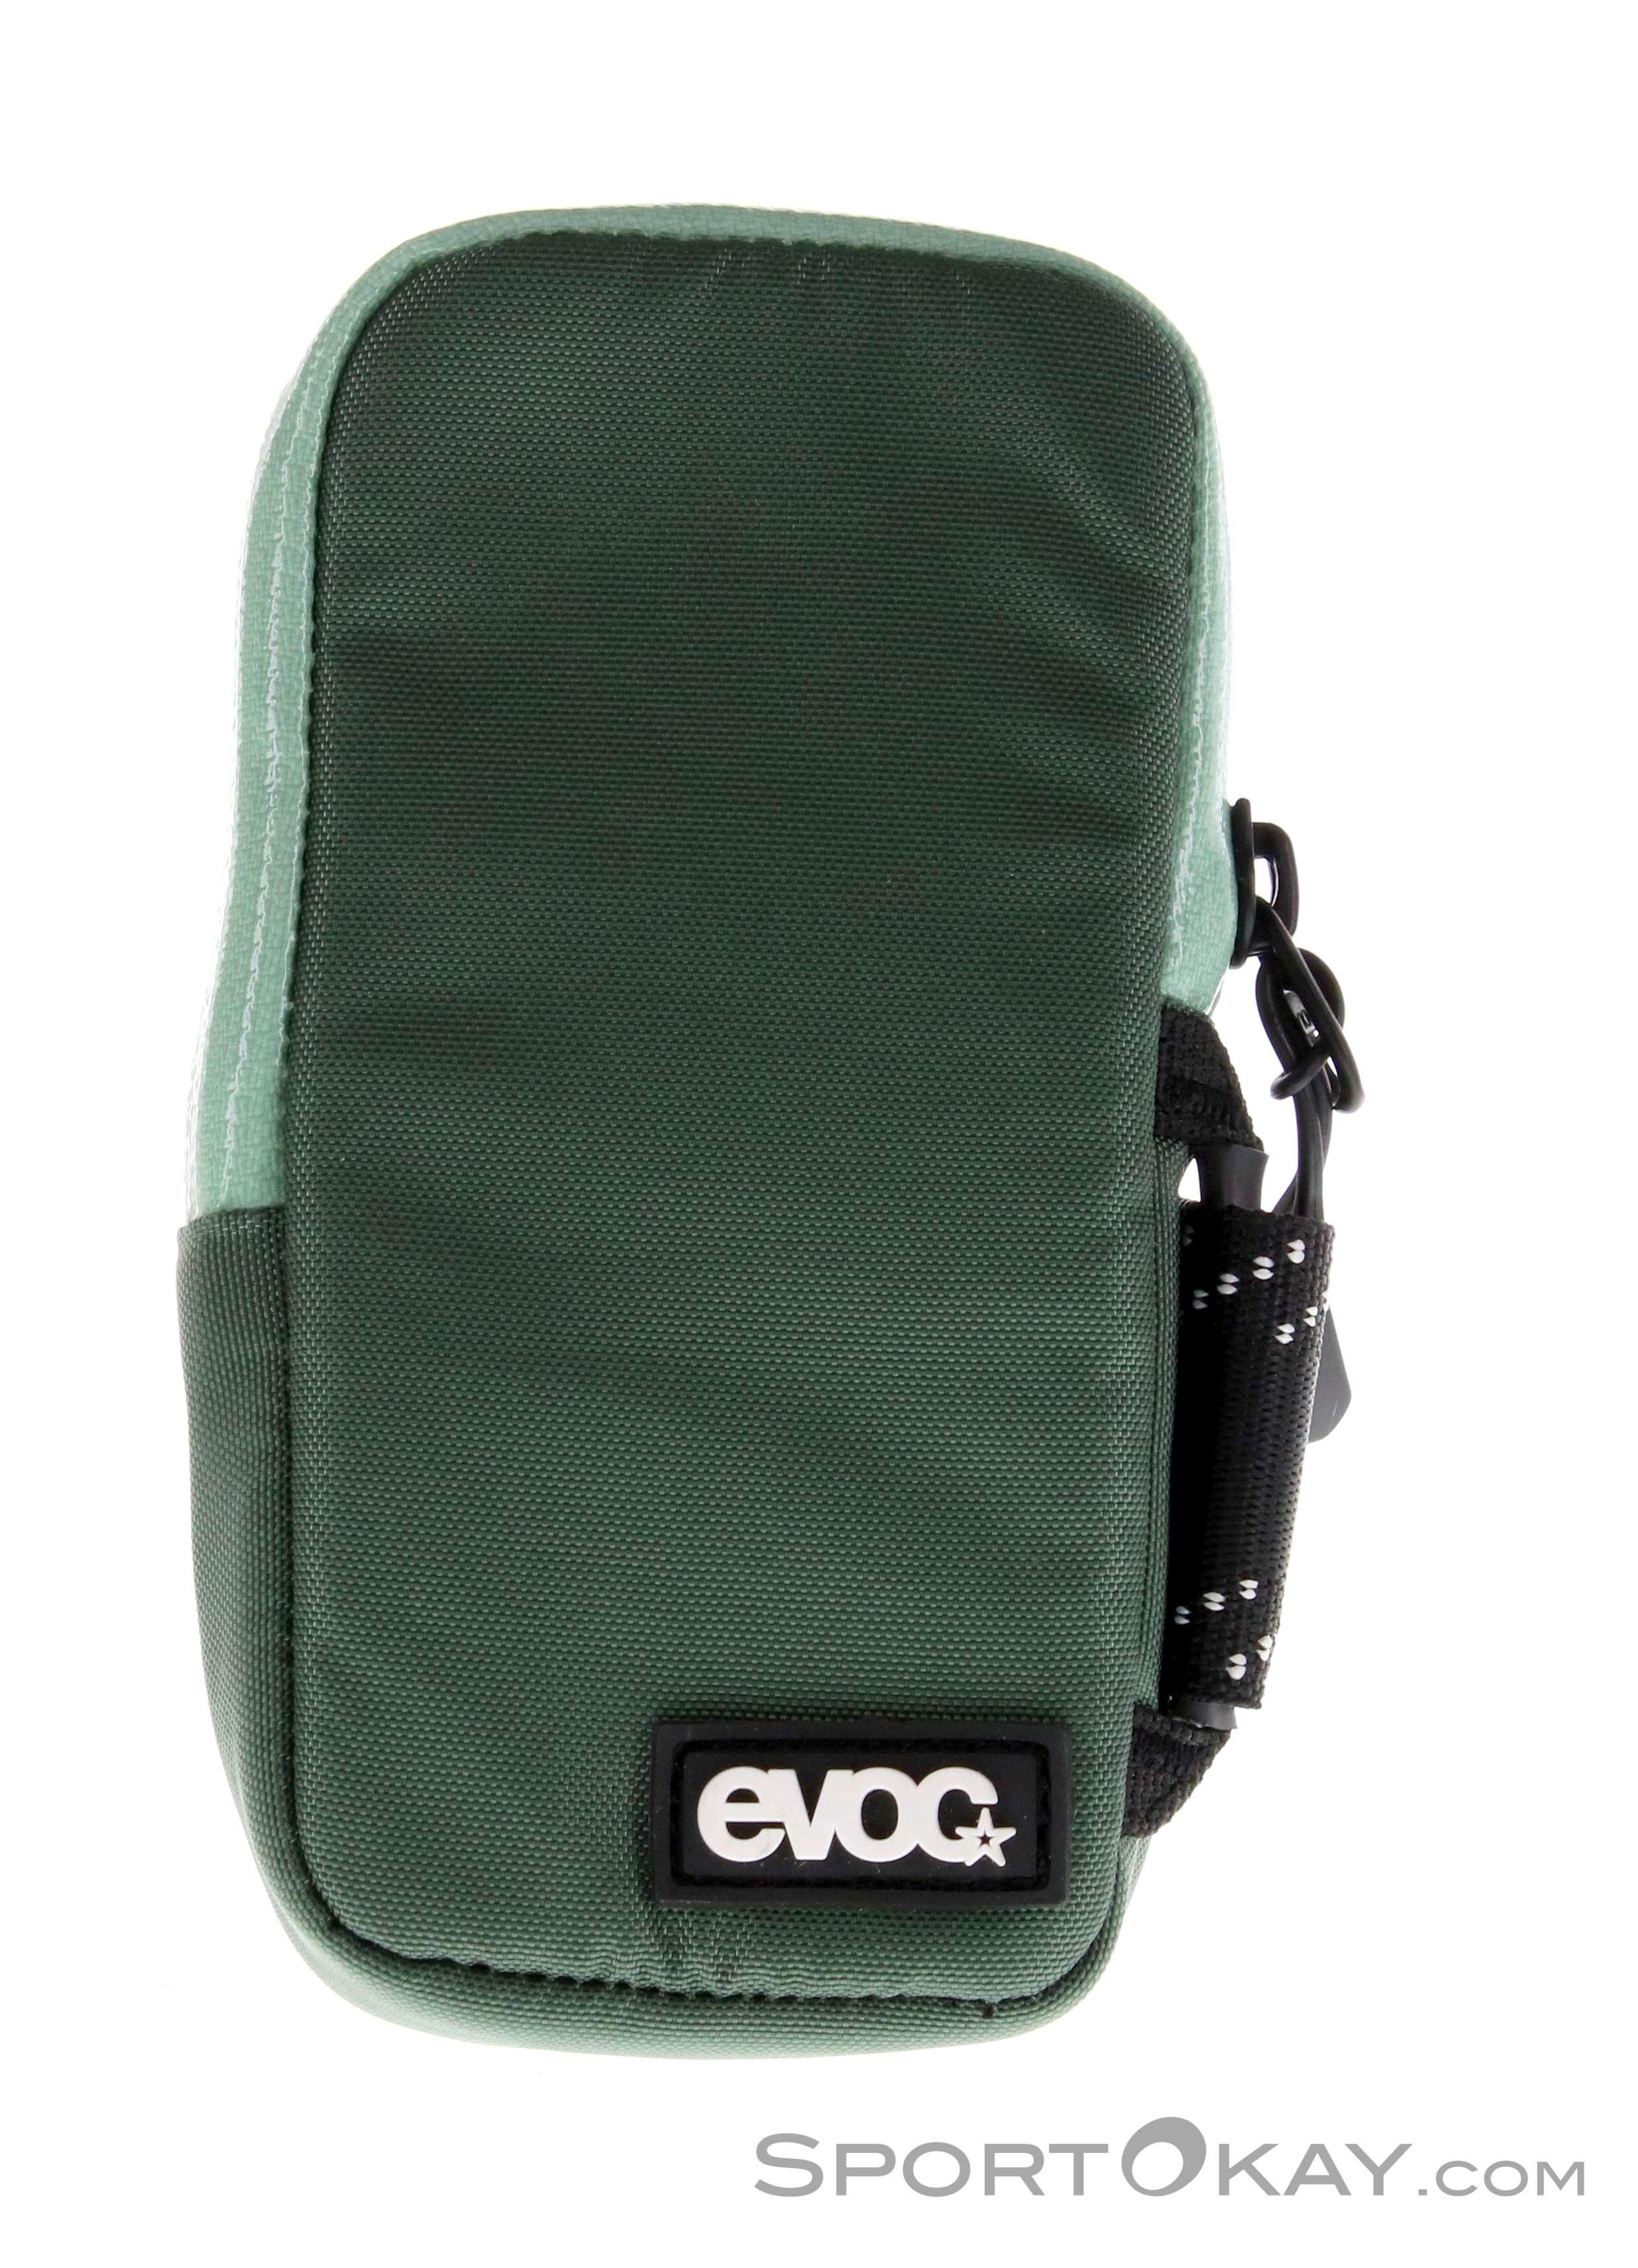 Evoc Evoc Phone Case Handytasche